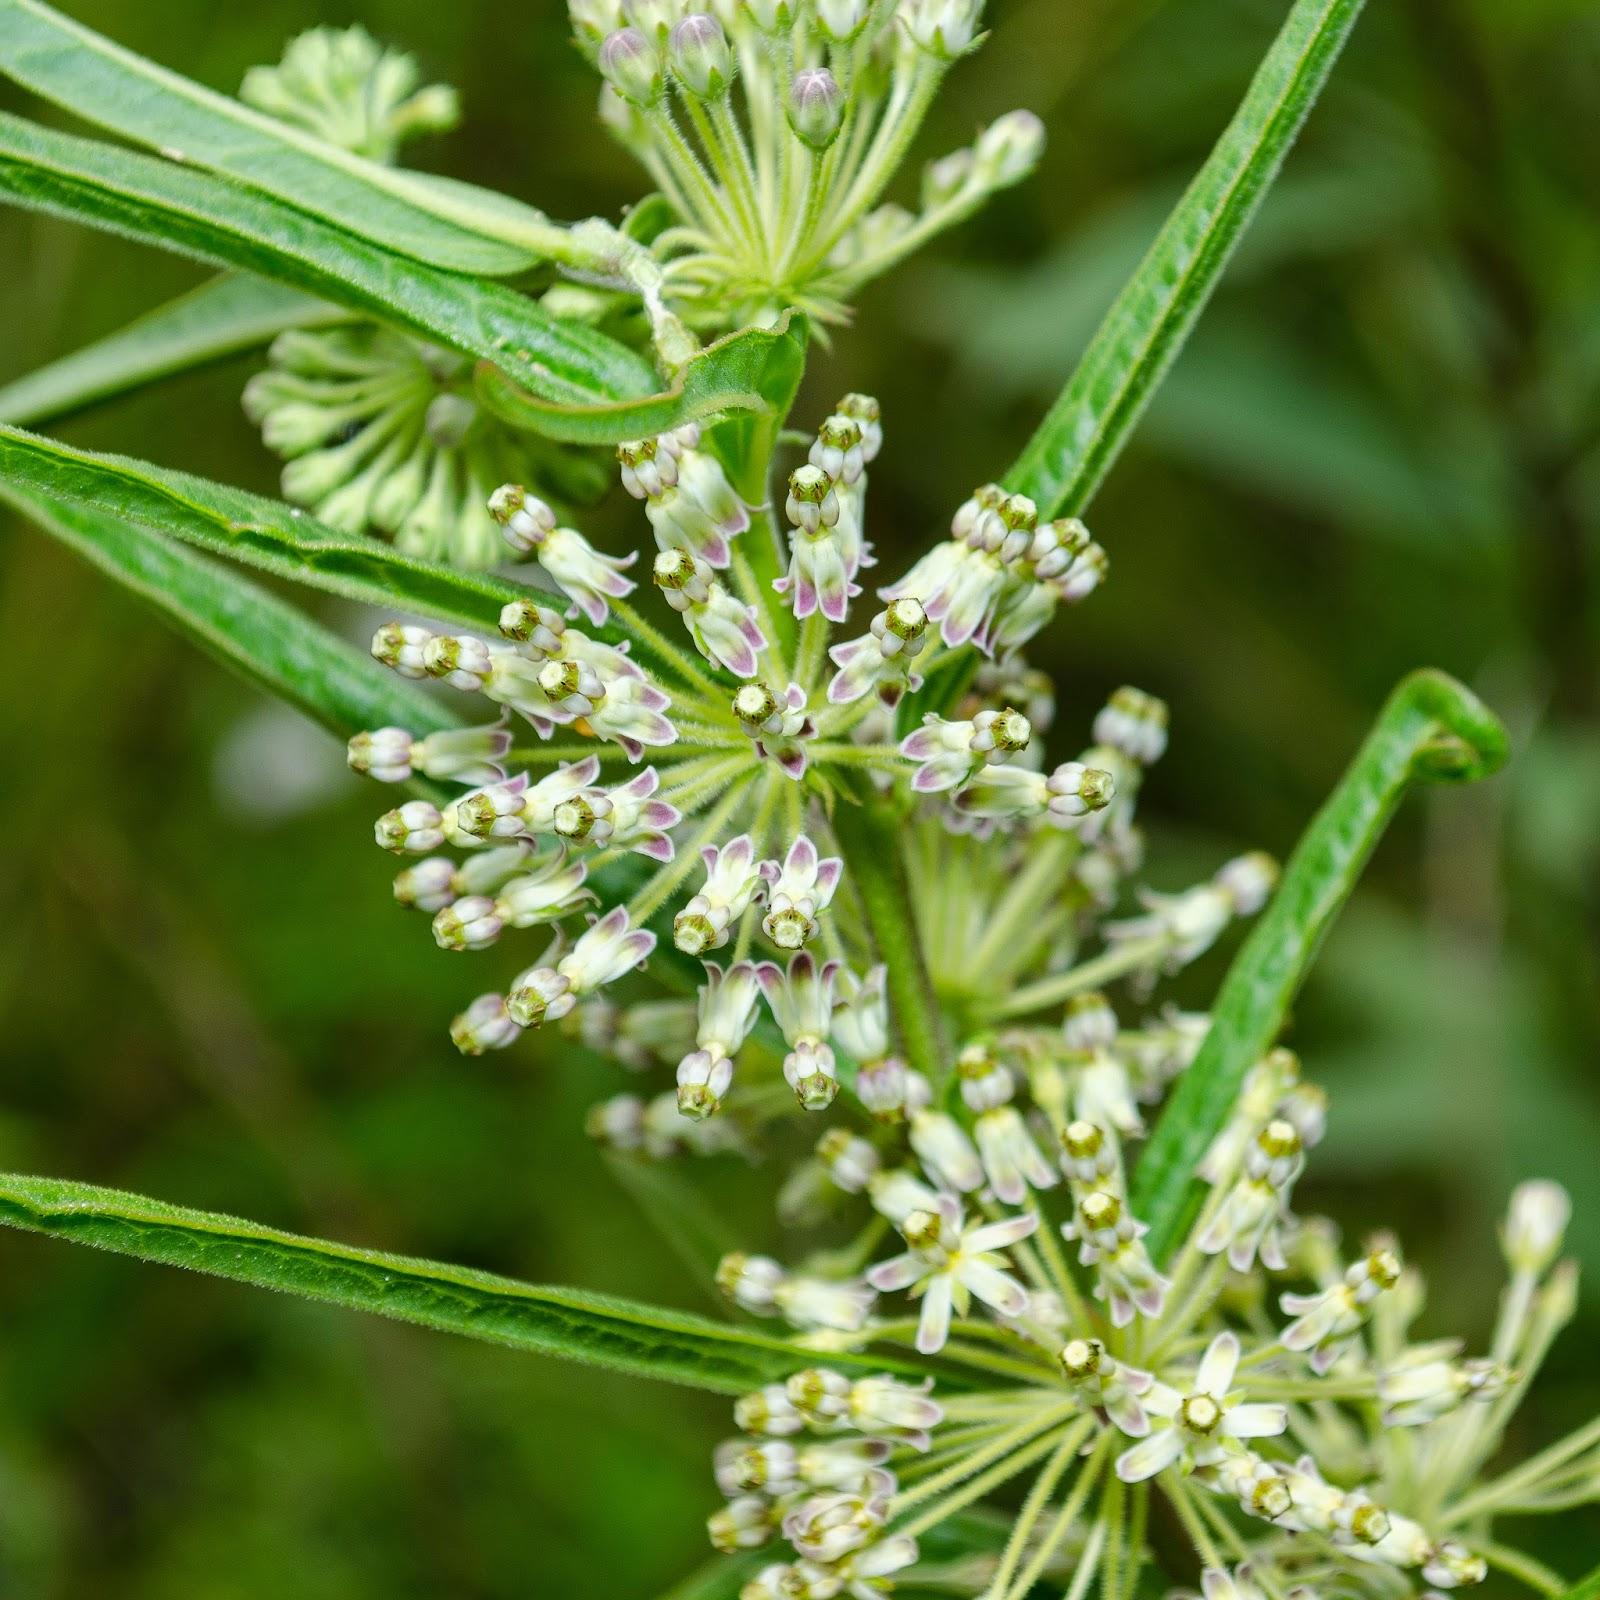 Tall Green Milkweed, Asclepias hirtella